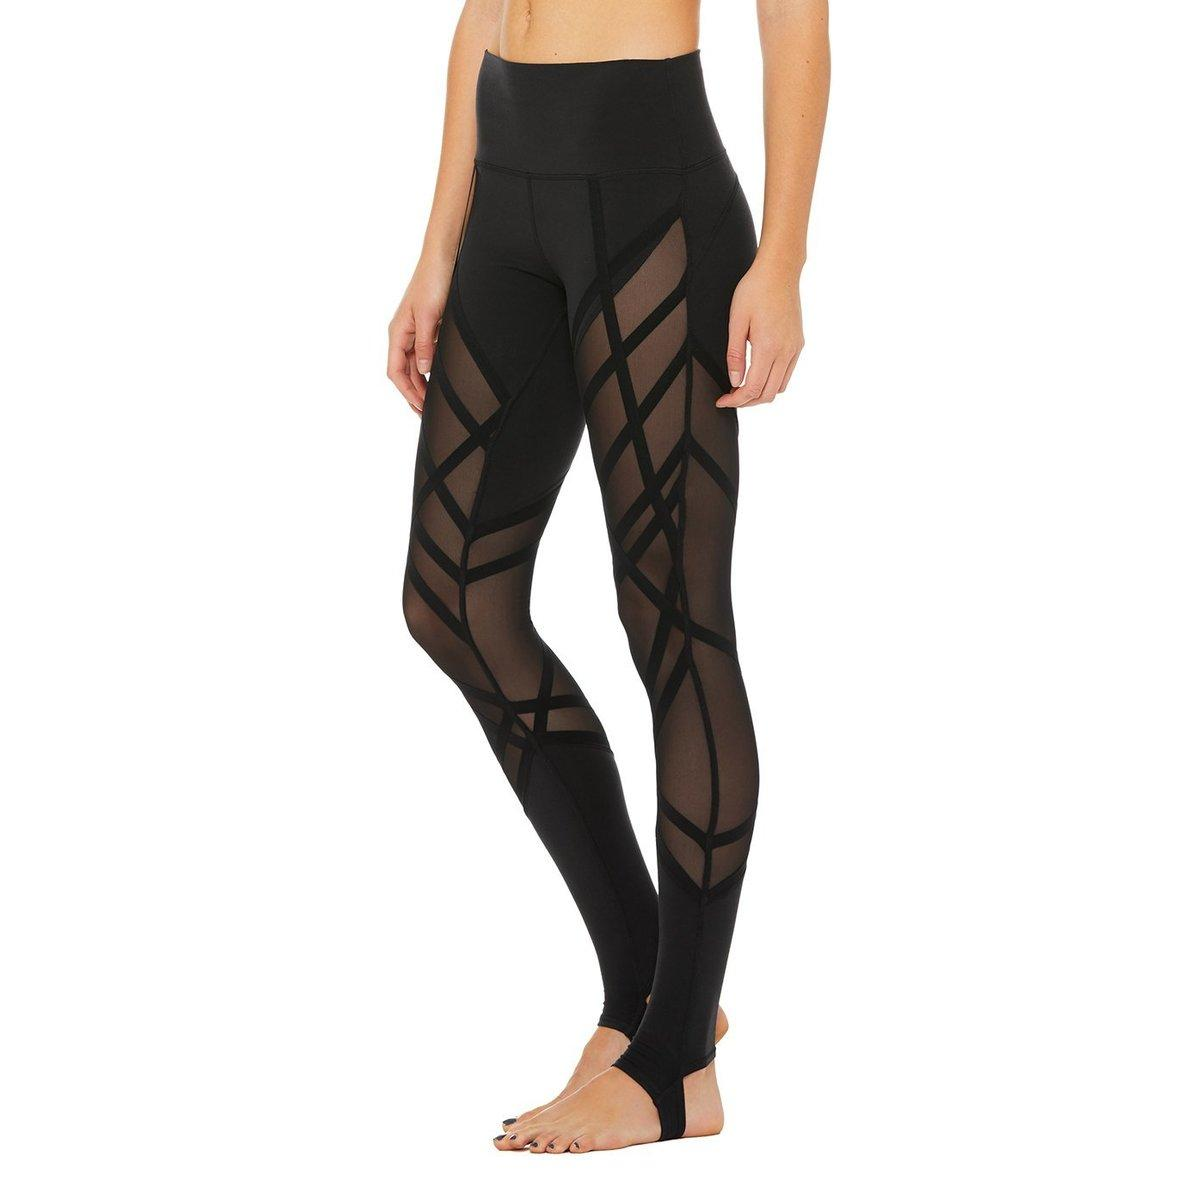 96476cf0e5d180 ... High-waist Wrapped Stirrup LEGGING – Womens - Lyst. View fullscreen